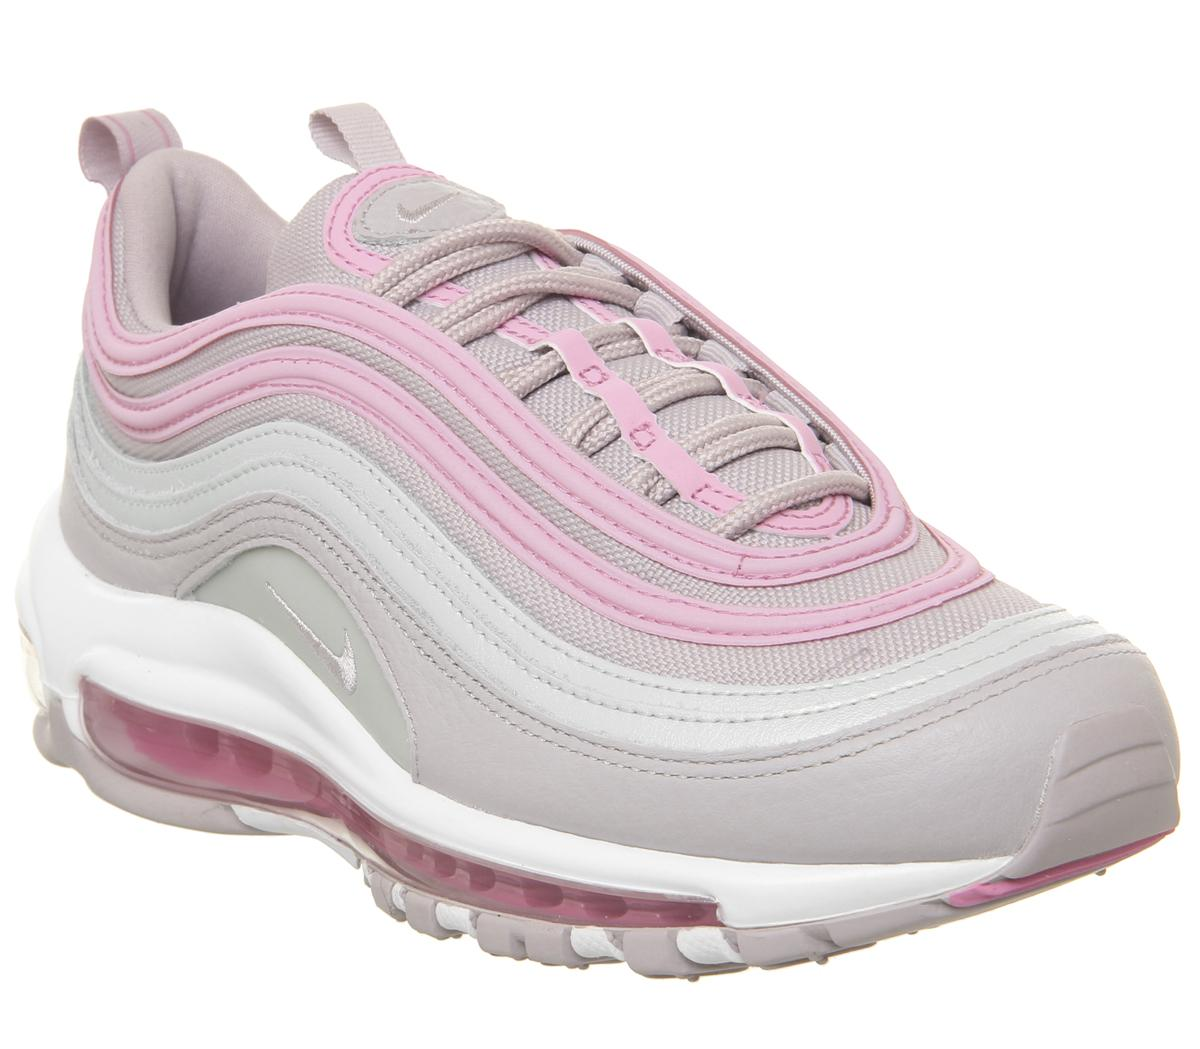 nike air max 97 womens pink